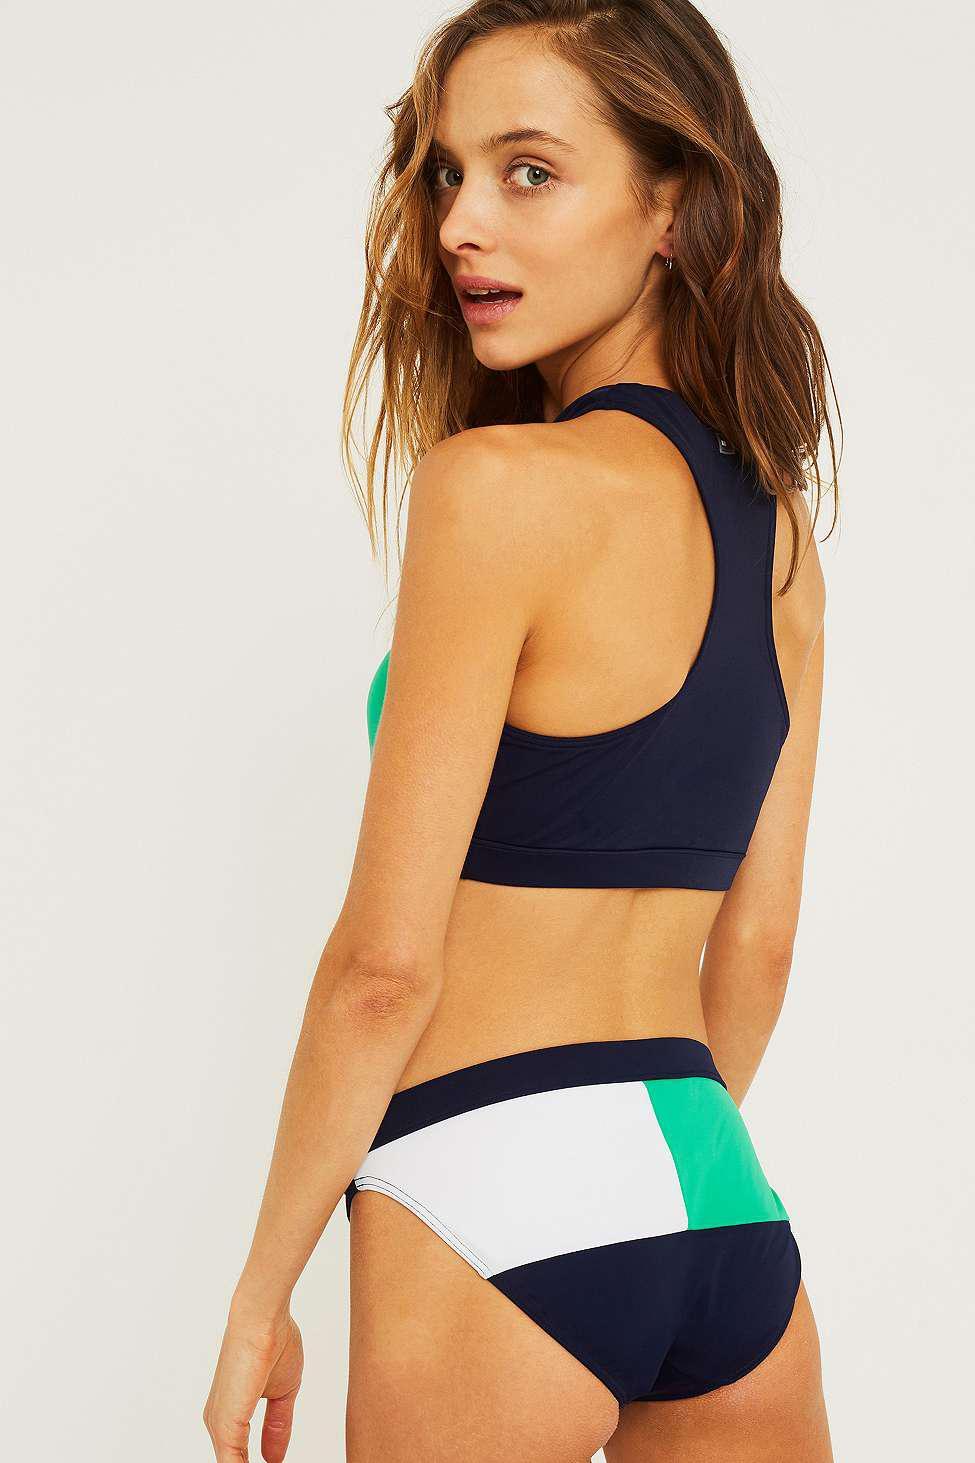 074fd146 Tommy Hilfiger Navy And Green Colour Block Bikini Bottoms - Womens M ...